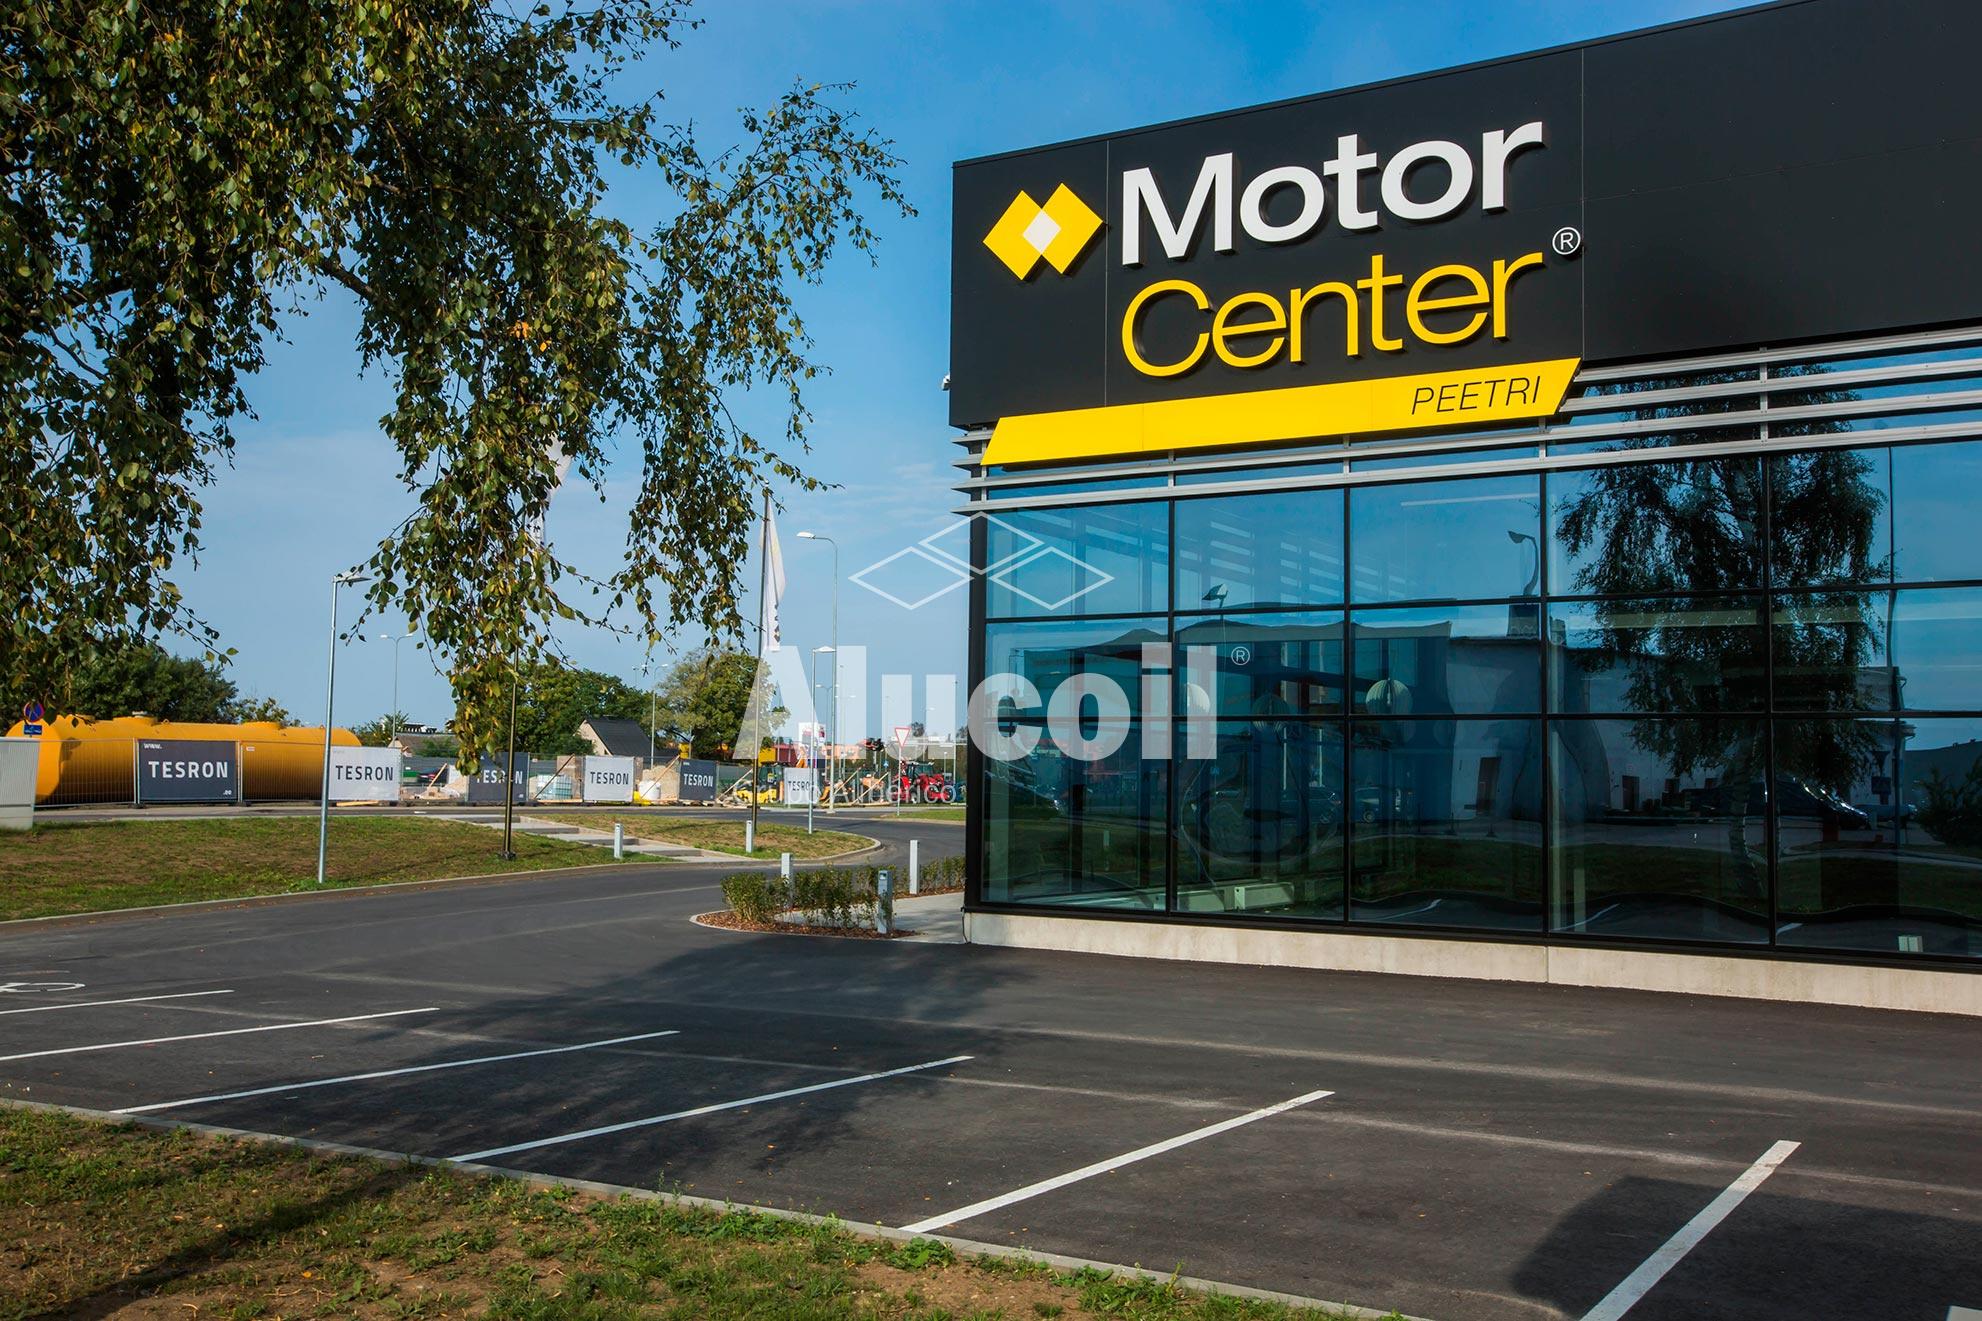 Moto Center Peetri Car Showroom